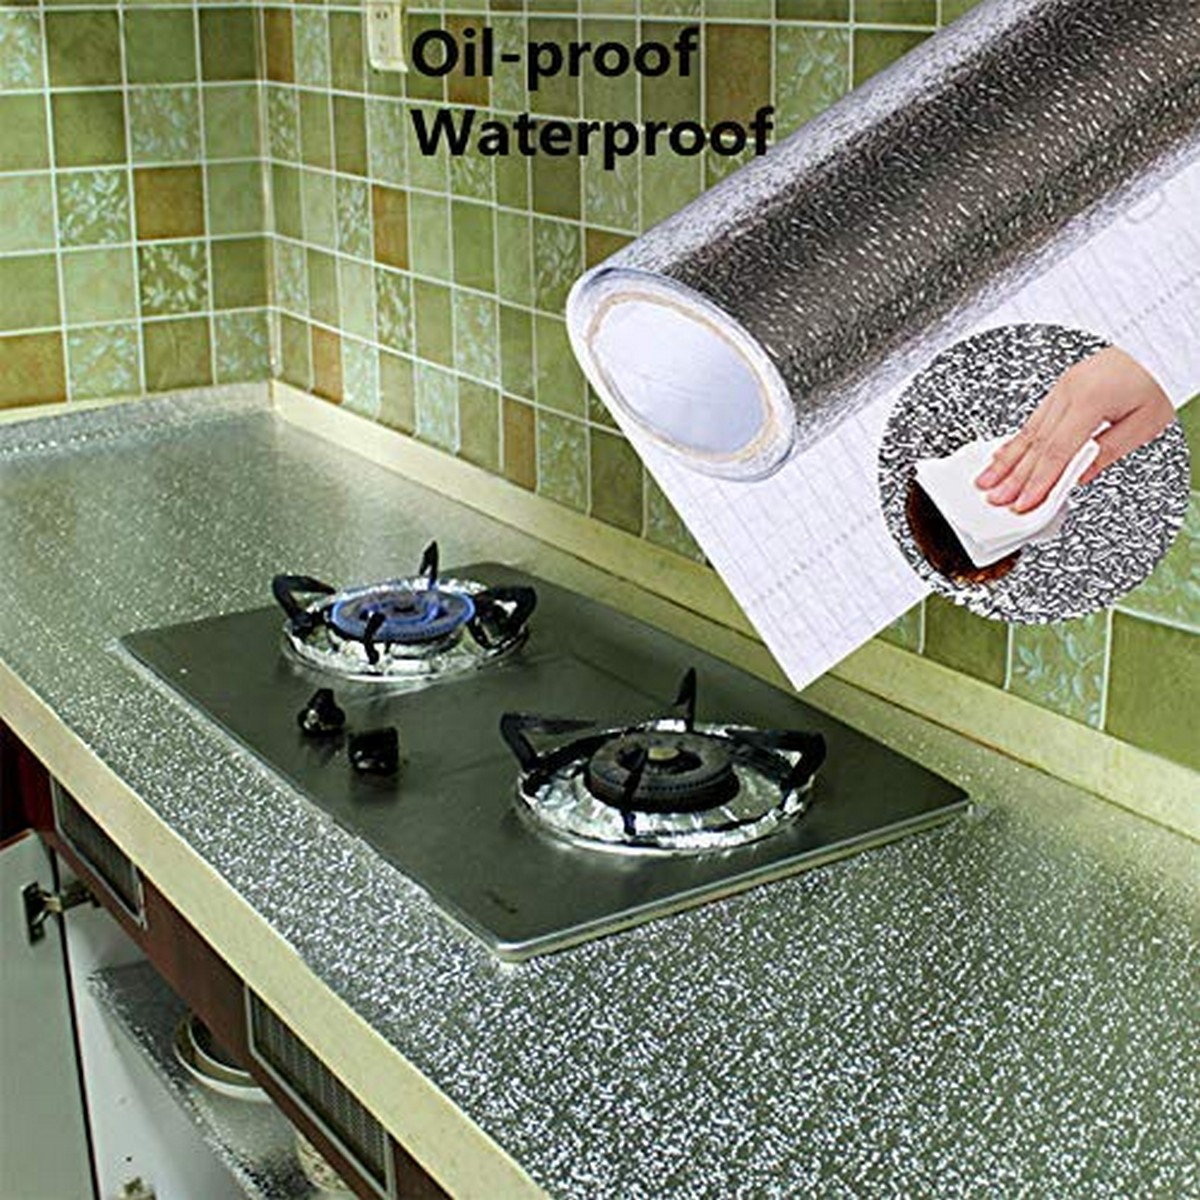 Aluminium Foil Self Adhesive Sticker Roll, Silver & Golden color Kitchen Backsplash Wallpaper, Heat Resistant Oil Proof Waterproof Aluminium Sheet DIY Sticker for Stove, Shelves, Drawers, Home, Cabinet, Furniture, Wall 30x100cm (Code 1 FoilSheet Silver )